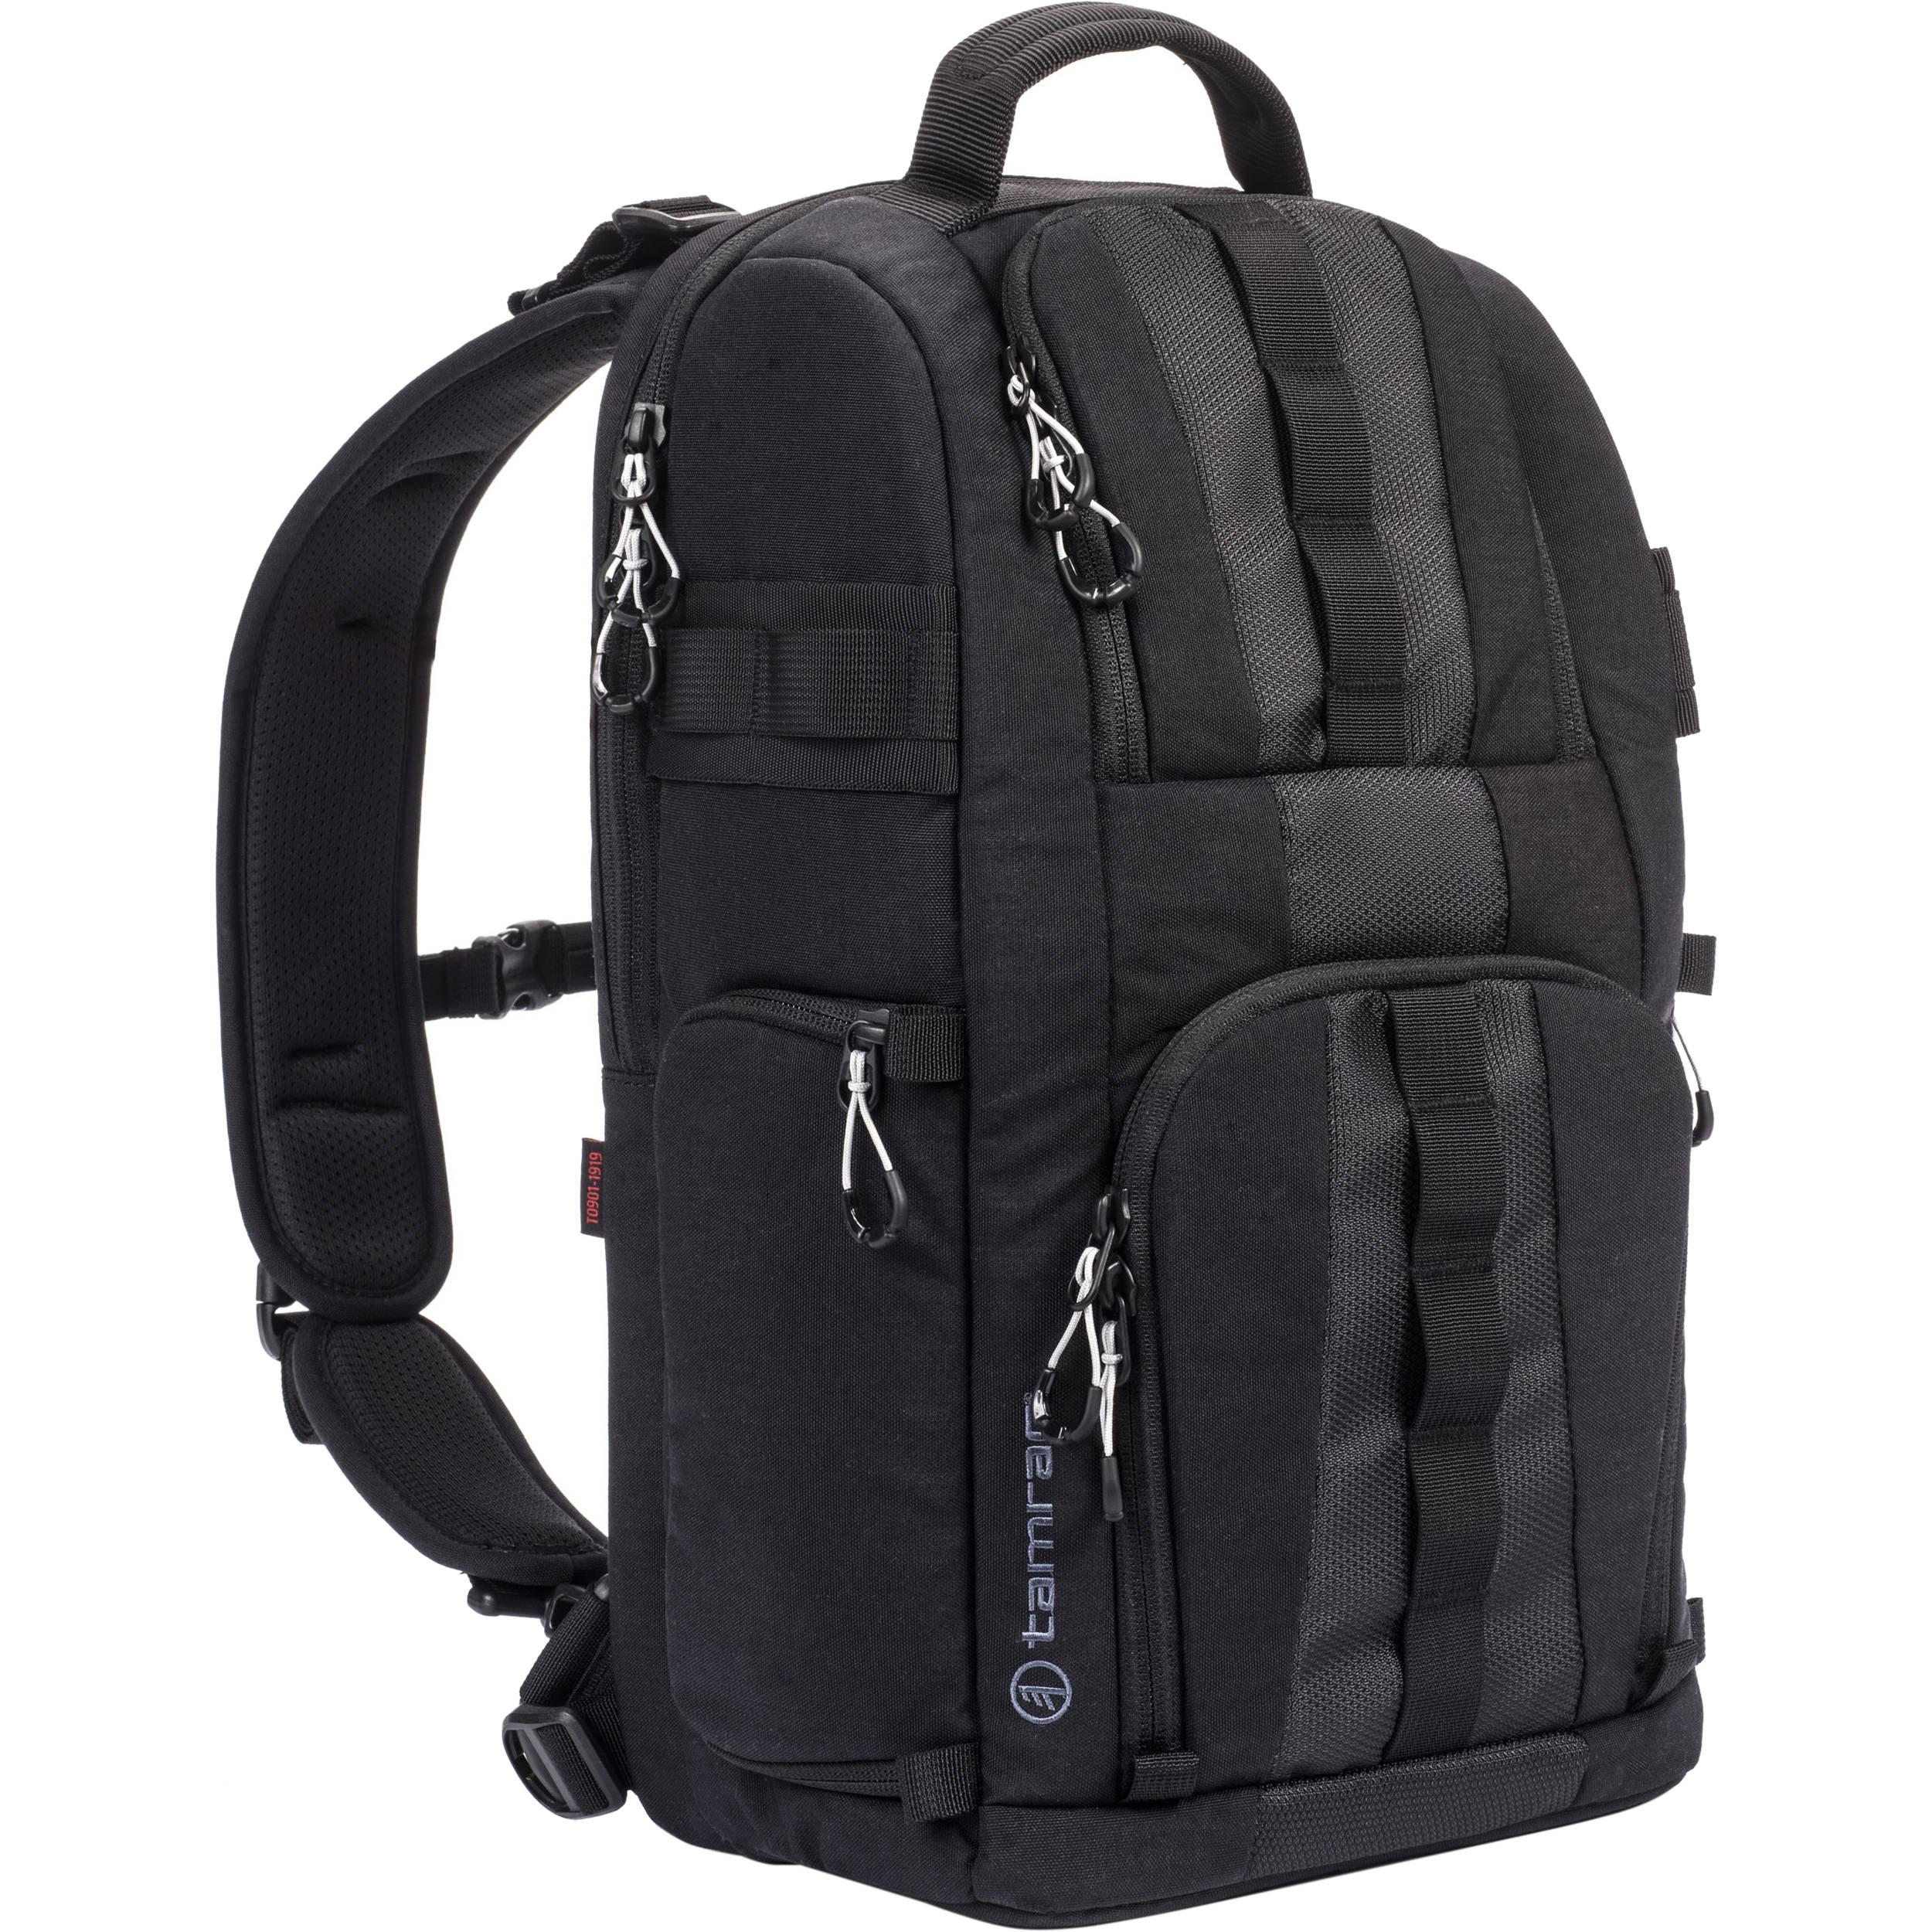 Tamrac  Corona 14 Convertible Pack (Black) $59.95 @ B&H Photo w/ Free Shipping